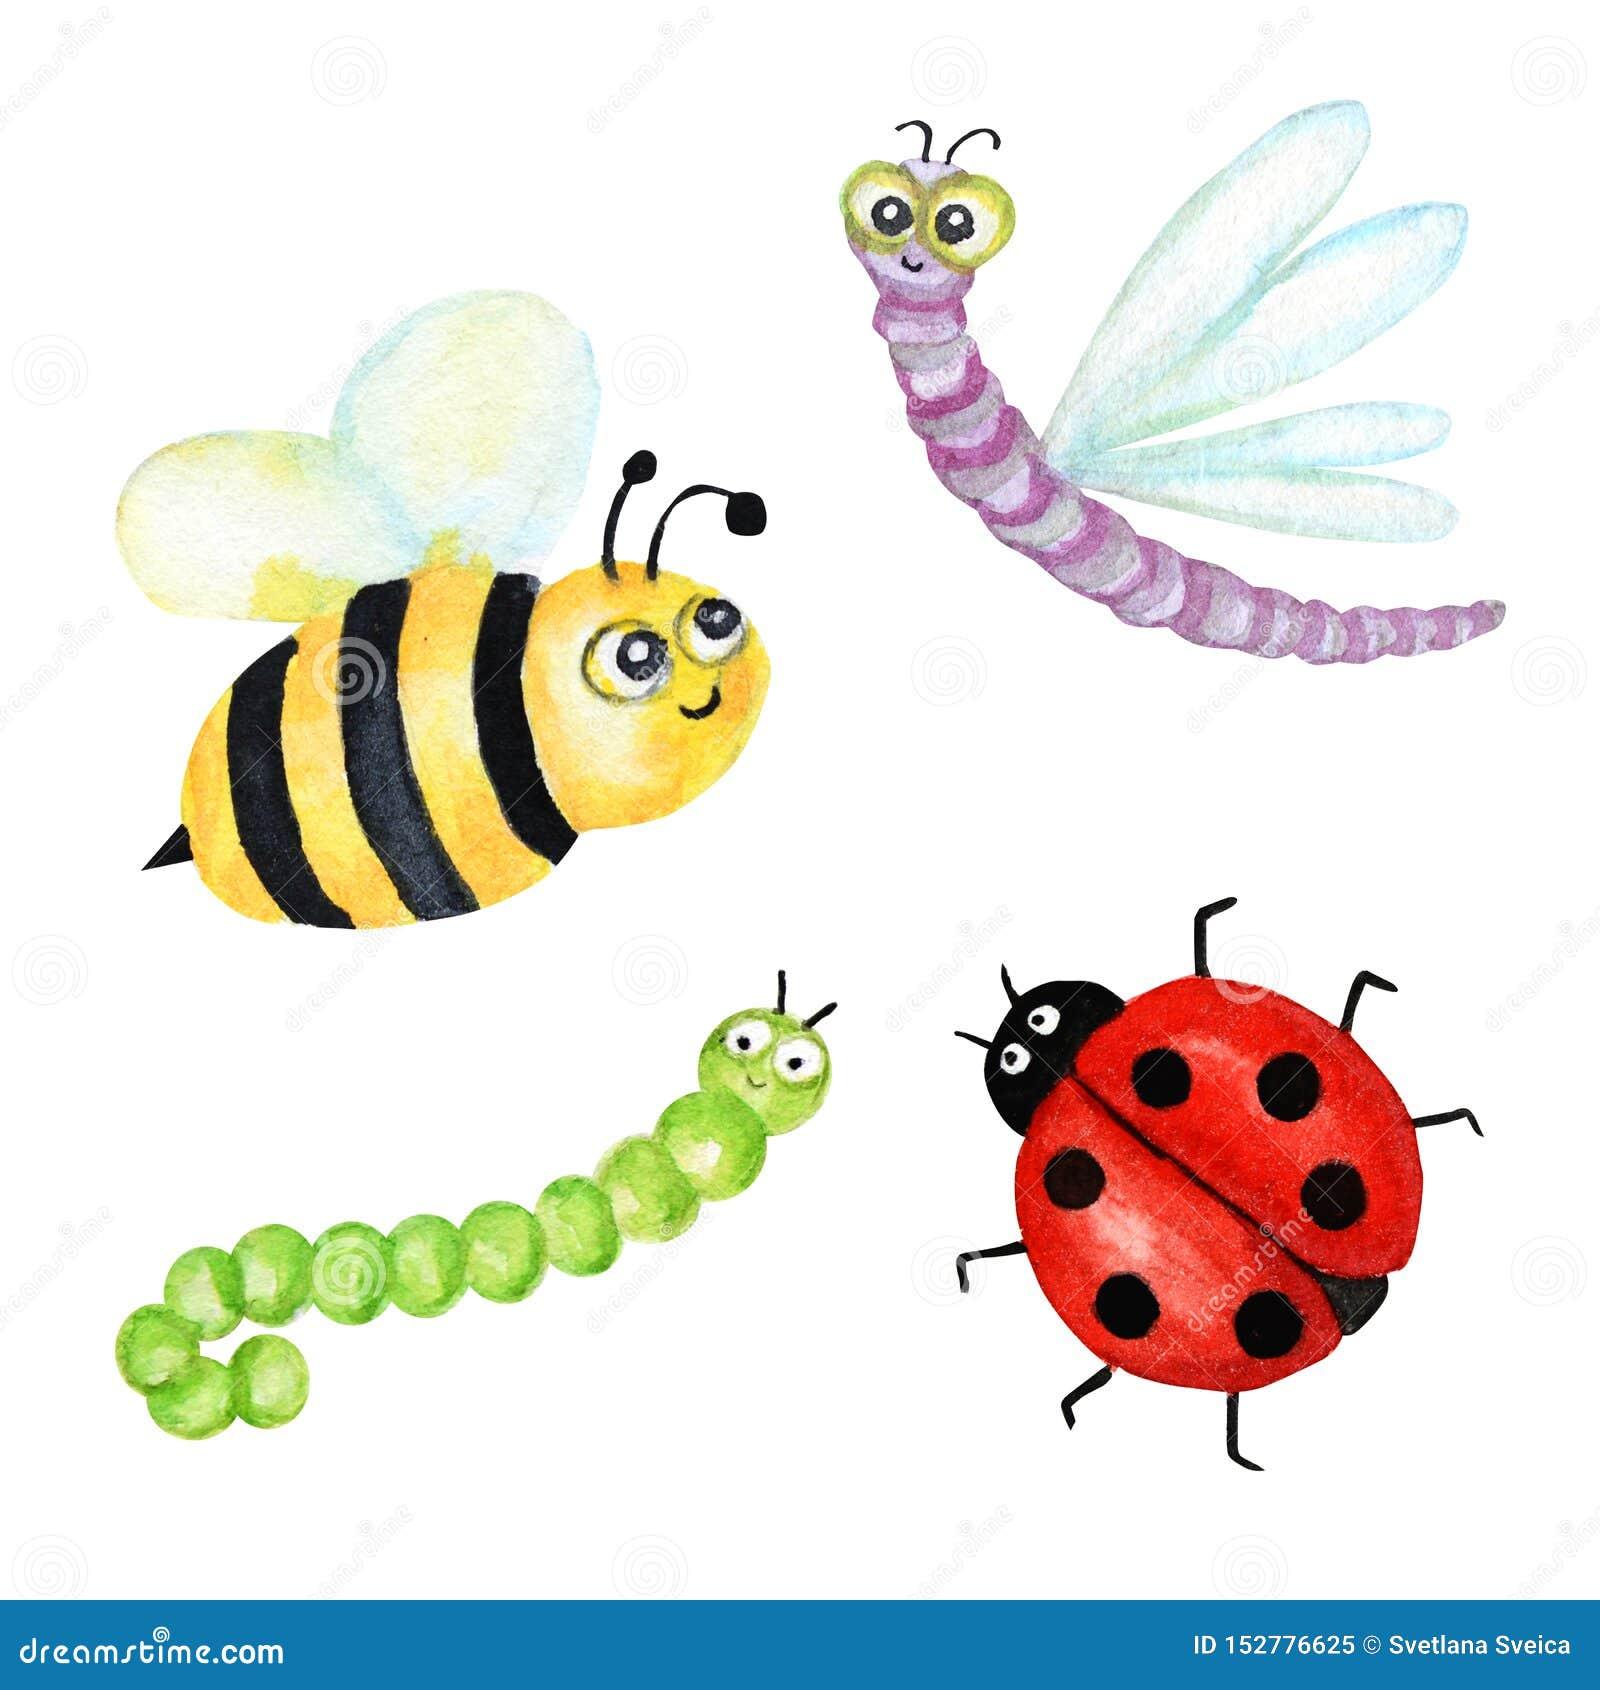 594 Cartoon Bee Photos Free Royalty Free Stock Photos From Dreamstime